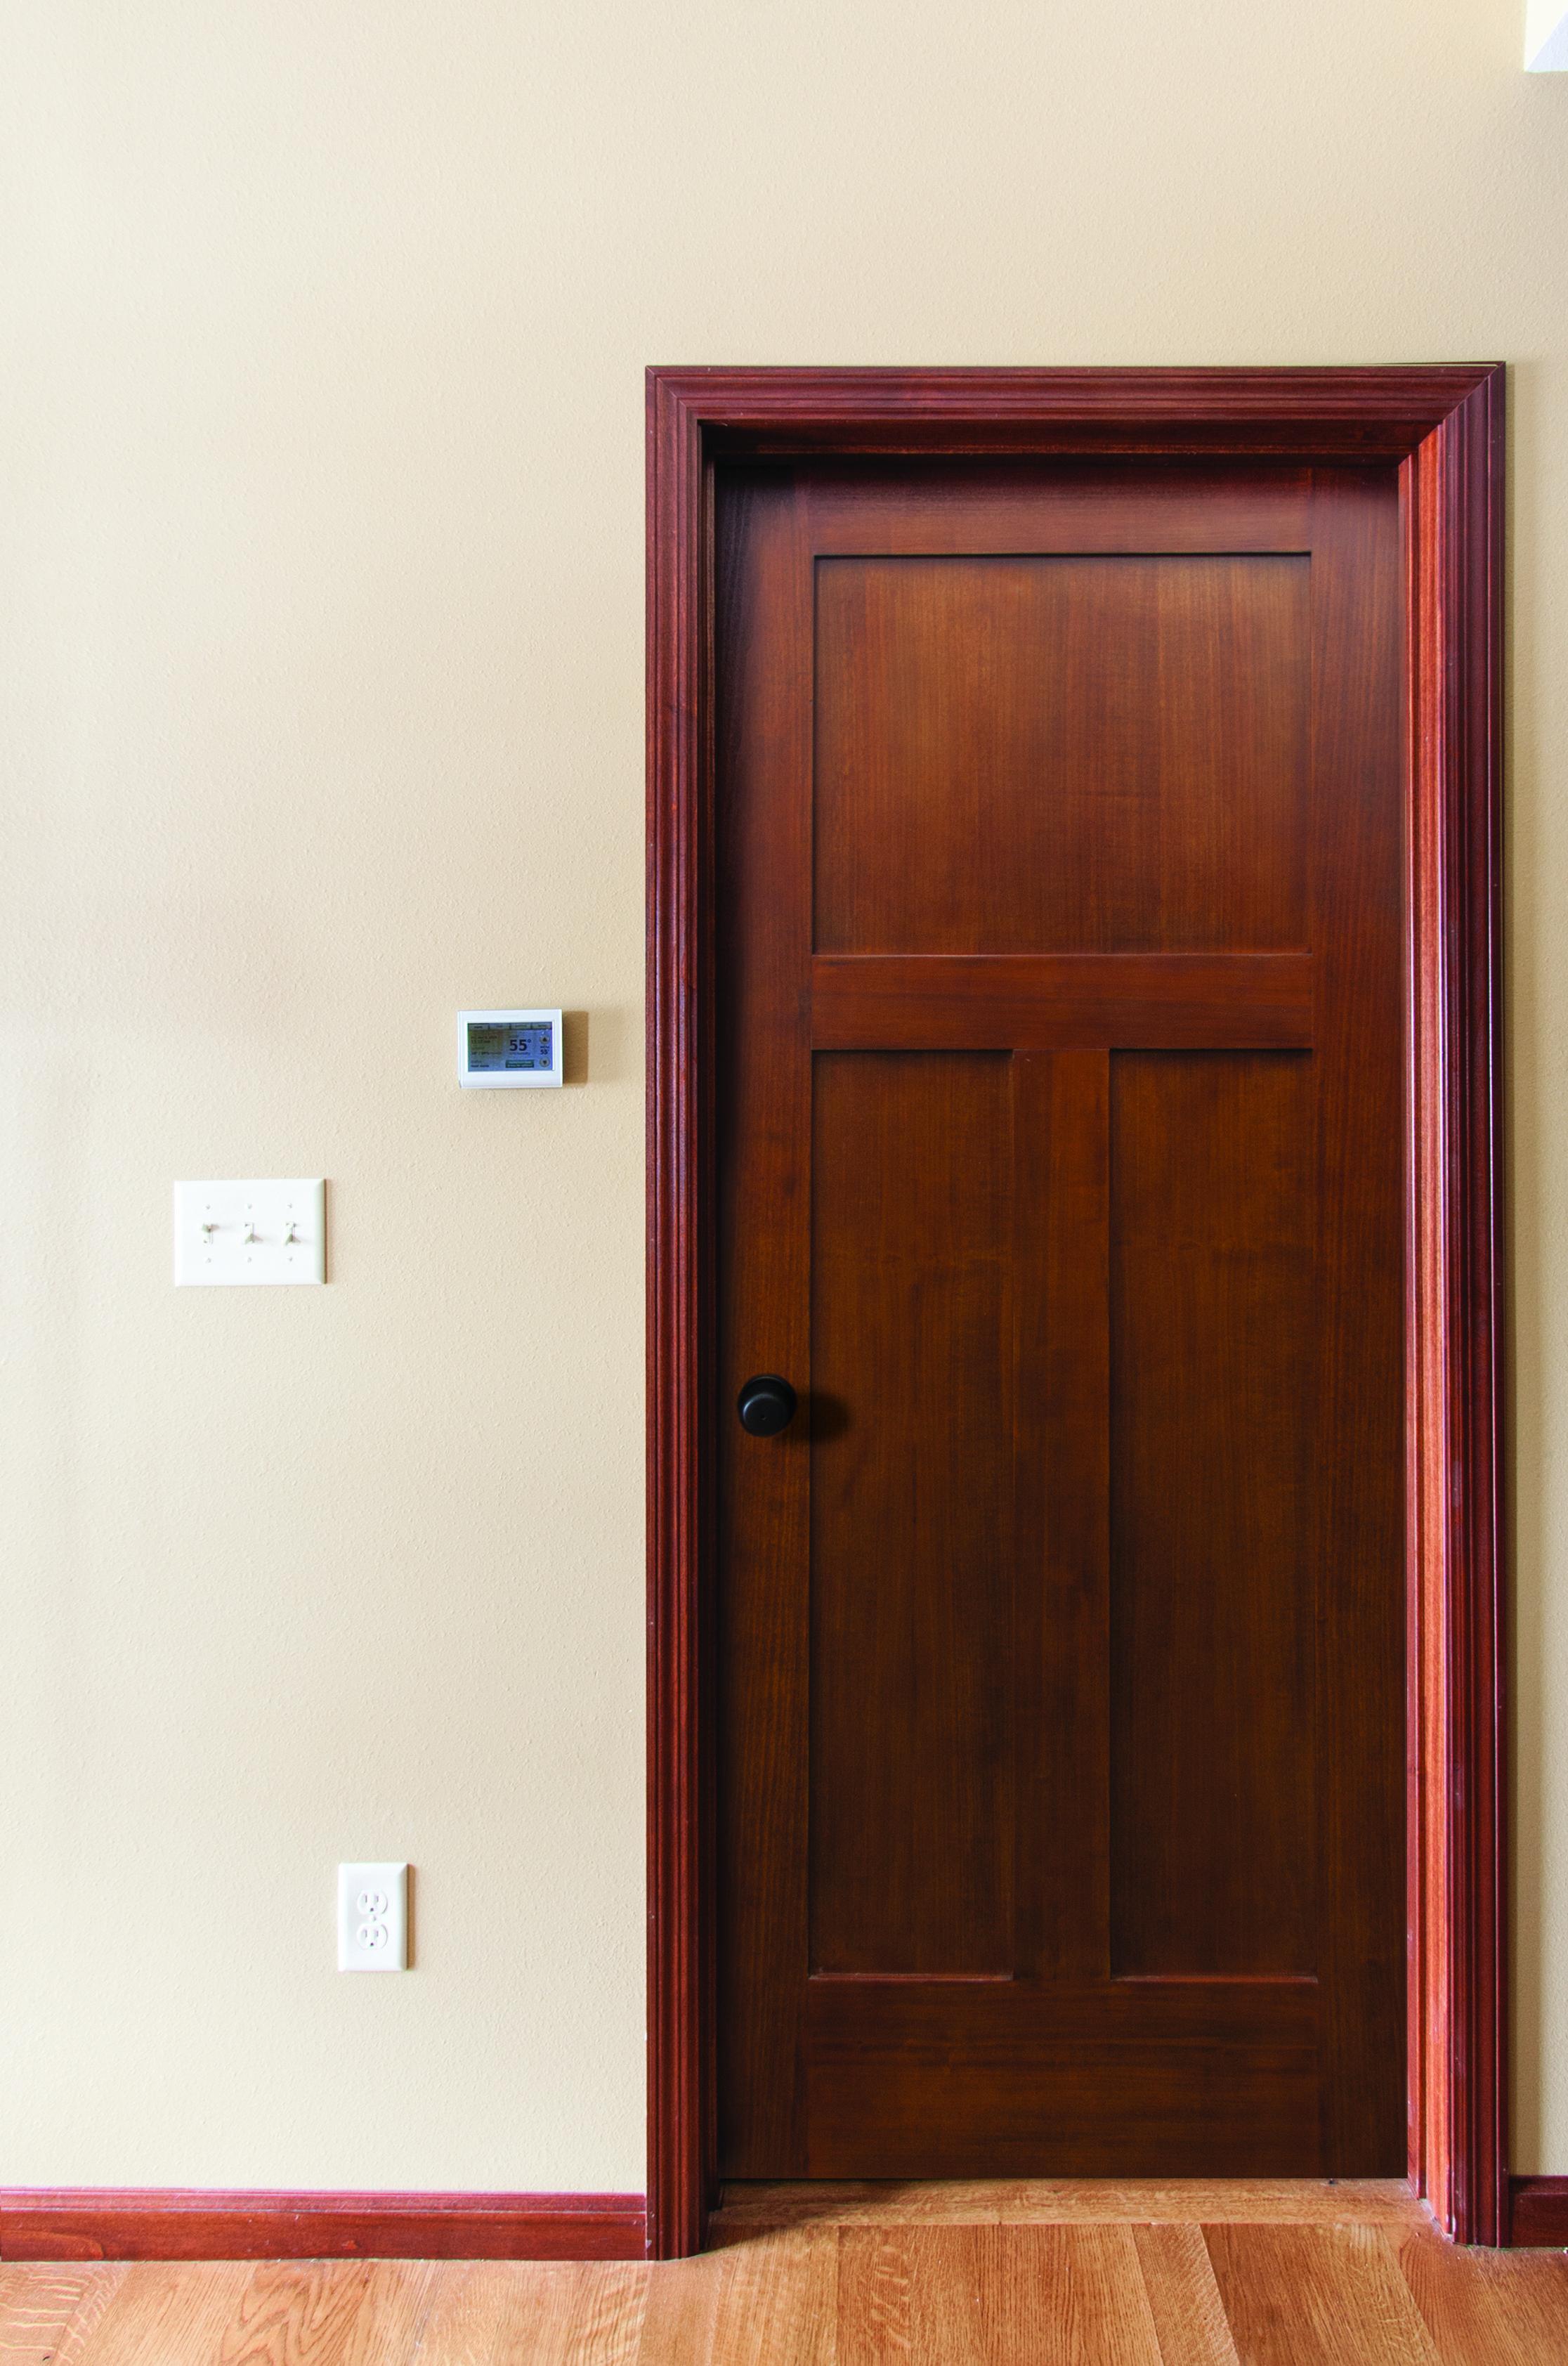 The Poplar 3 Panel Mission Door Prefinished In Gunstock Will Save You Work And Look Beautiful Sliding Doors Interior Doors Interior Craftsman House